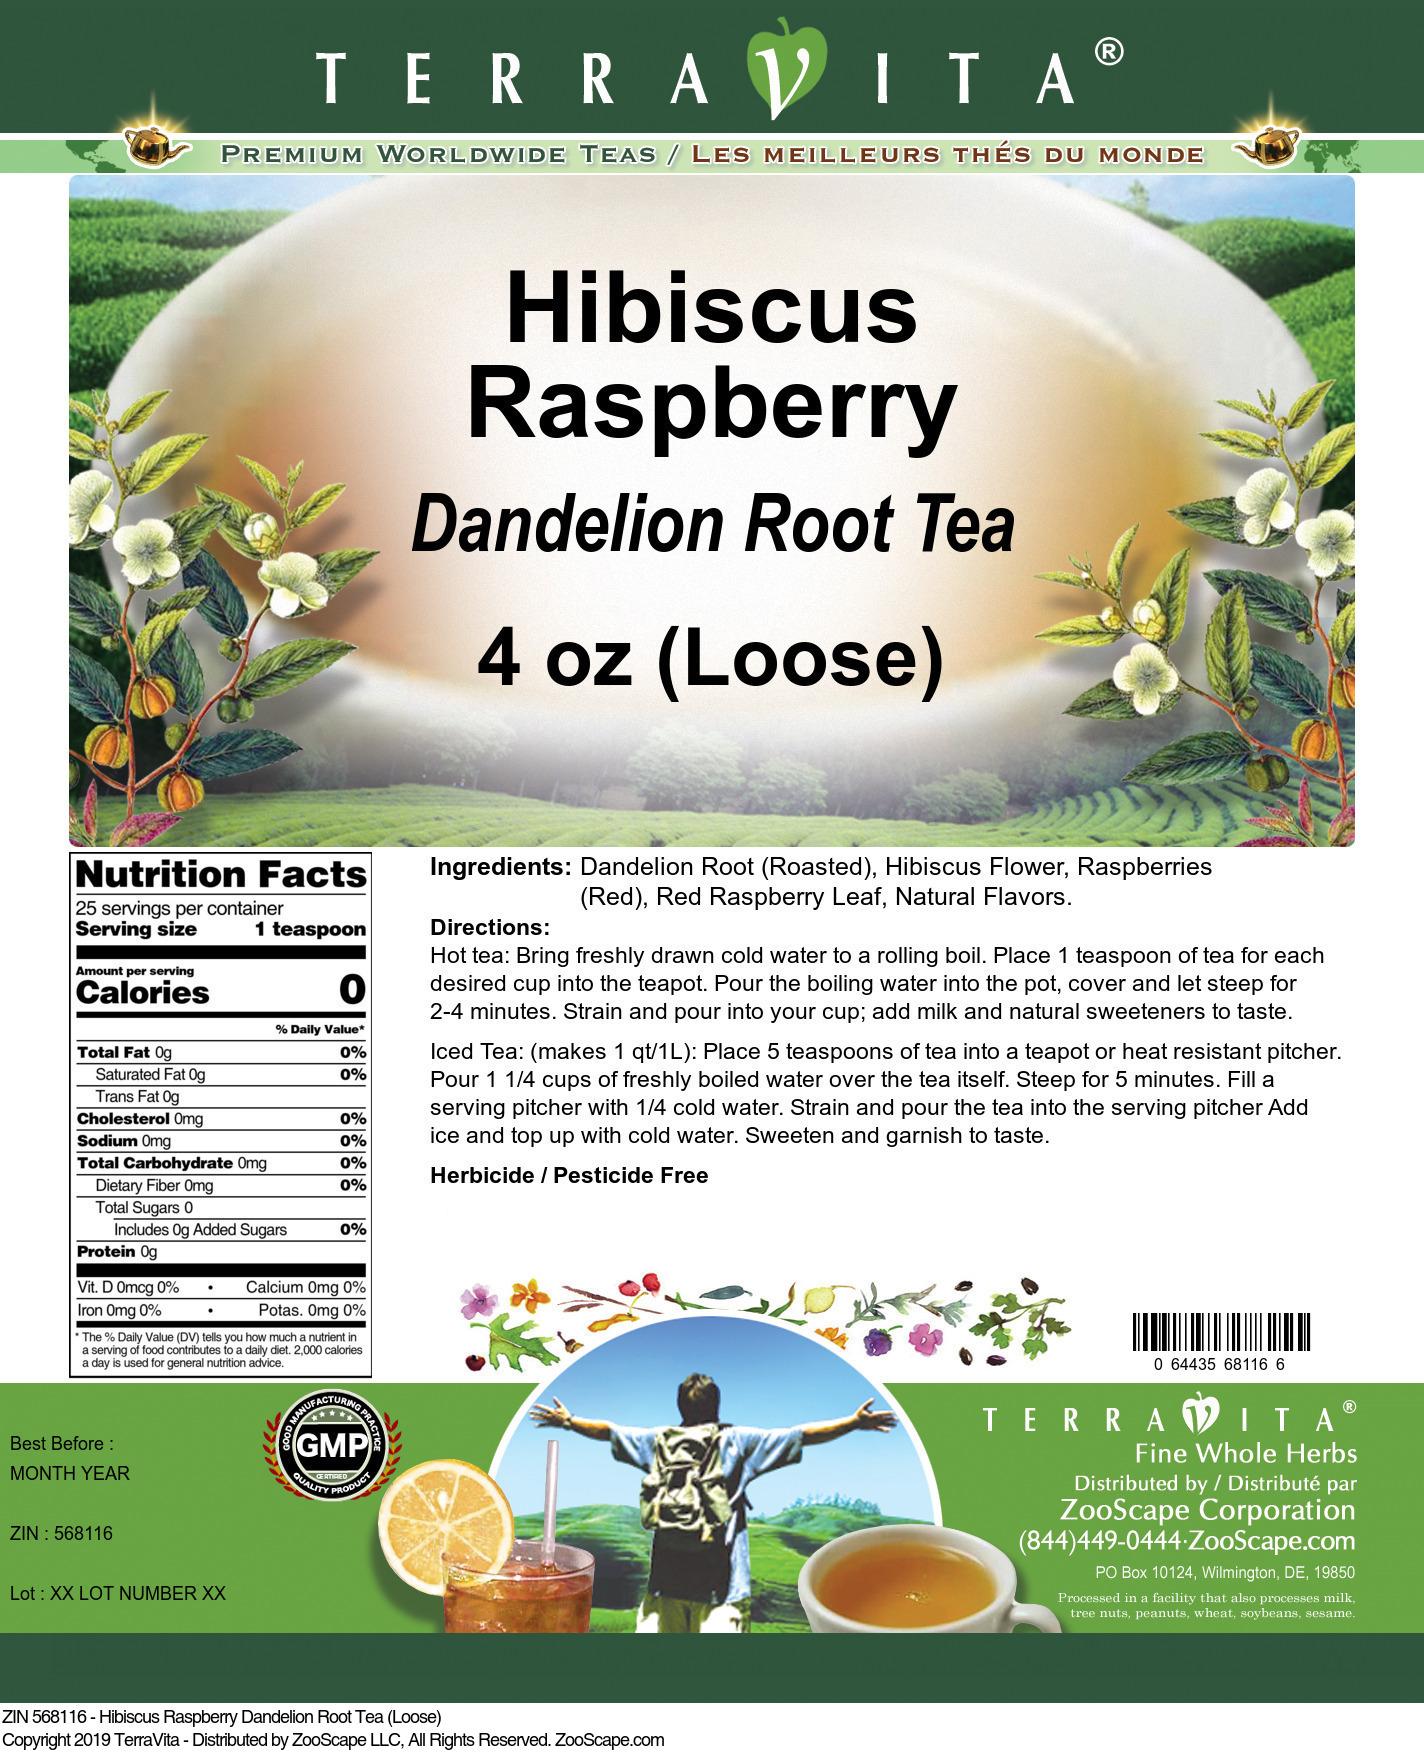 Hibiscus Raspberry Dandelion Root